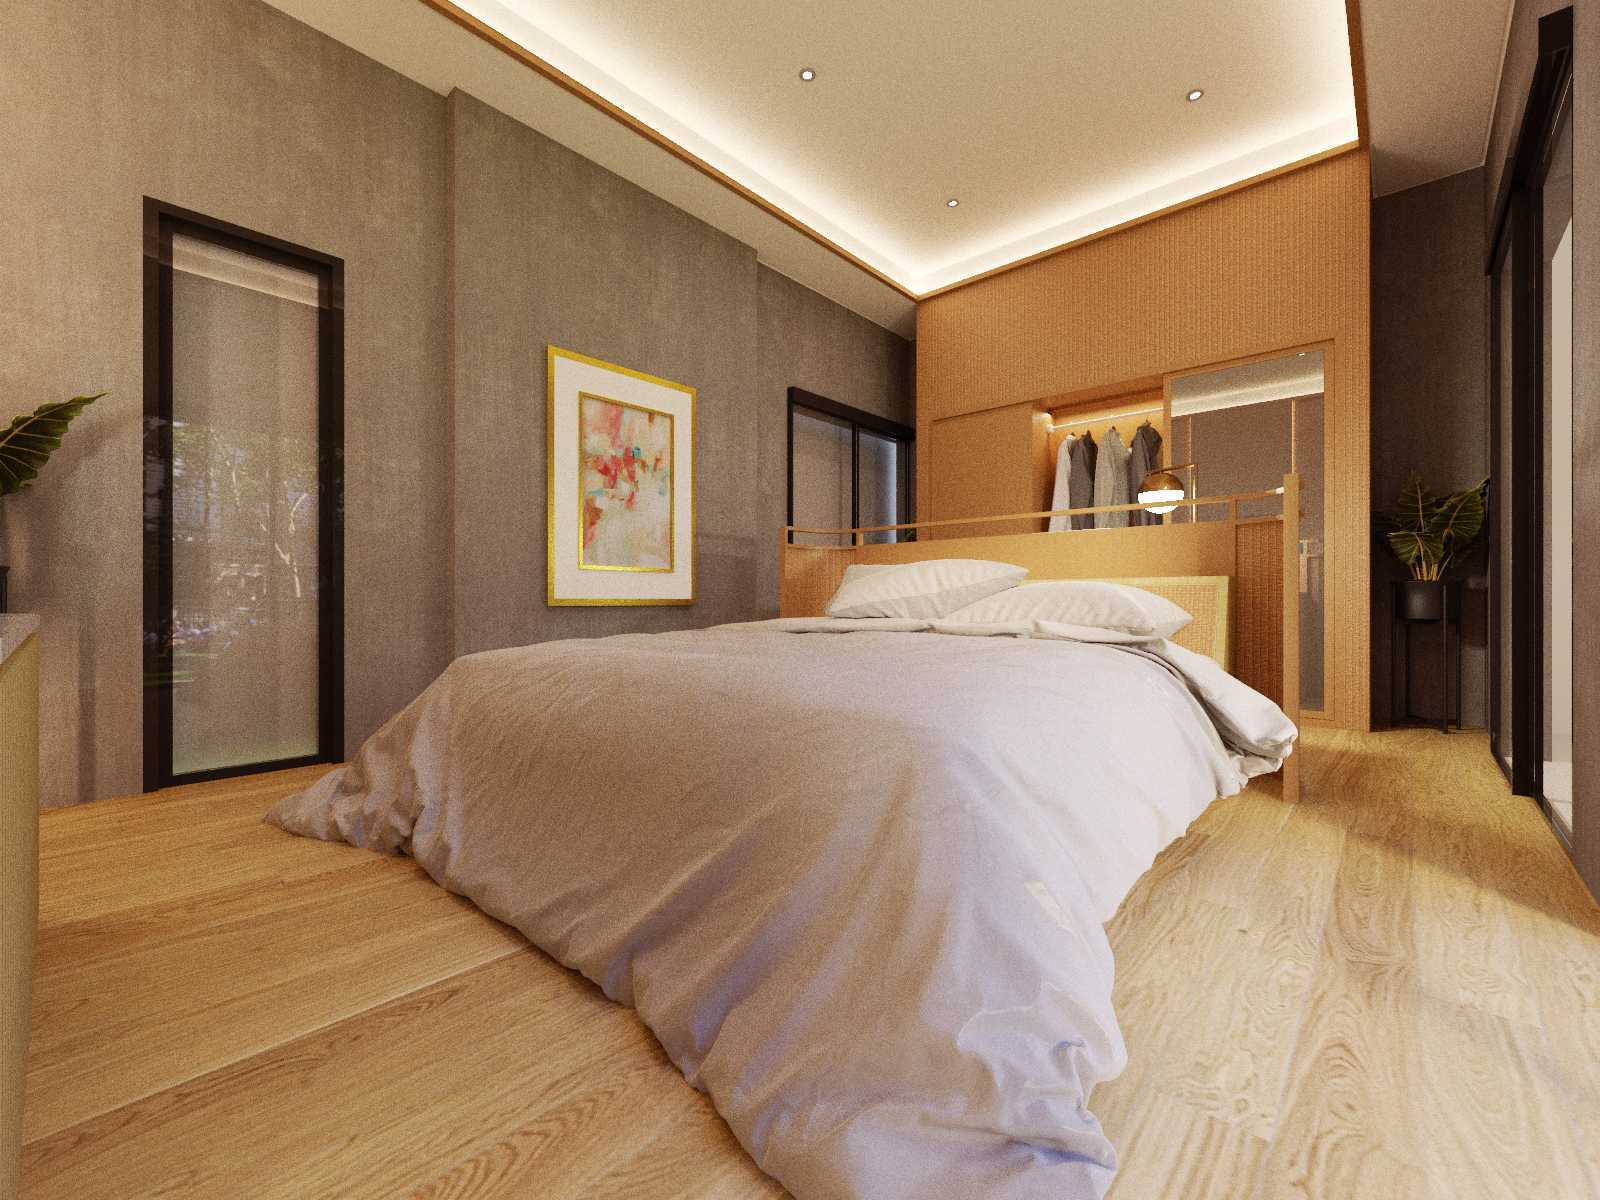 Mitrasasana - Design & Build As Master Bedroom Bekasi, Kota Bks, Jawa Barat, Indonesia Bekasi, Kota Bks, Jawa Barat, Indonesia Mitrasasana-Design-Build-As-Master-Bedroom   70268